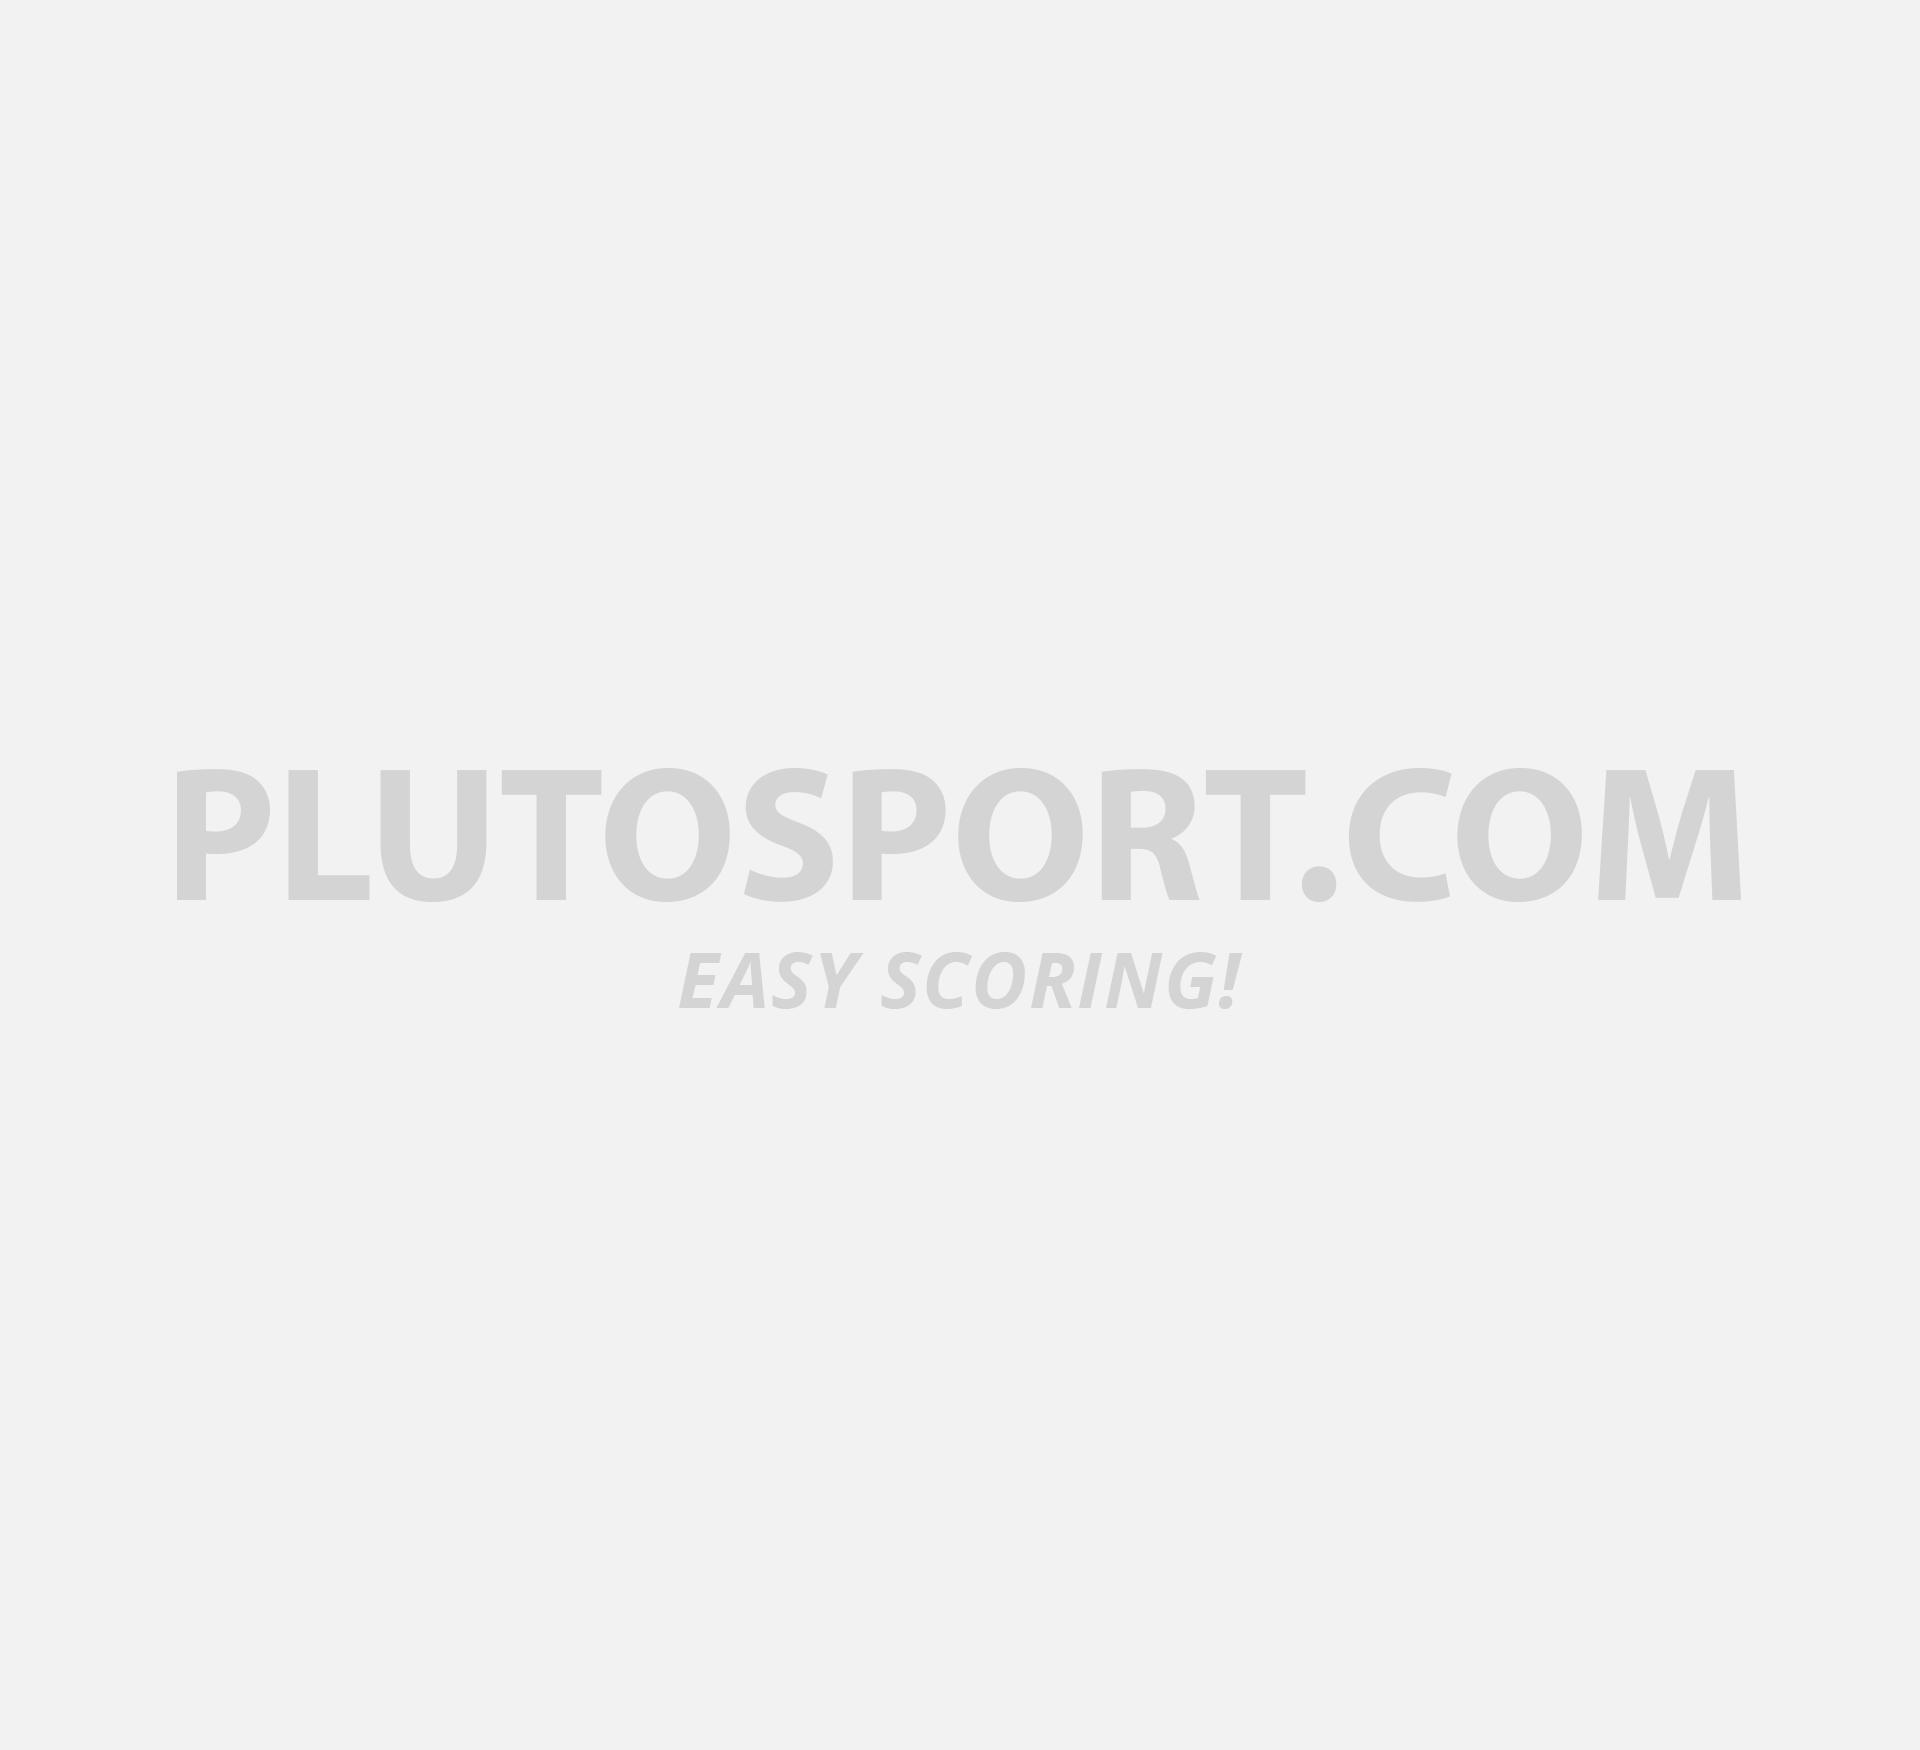 19f37f96433a Adidas Predator Absolado Instinct TF Football Shoes Junior - Turf shoes -  Shoes - Football - Sports